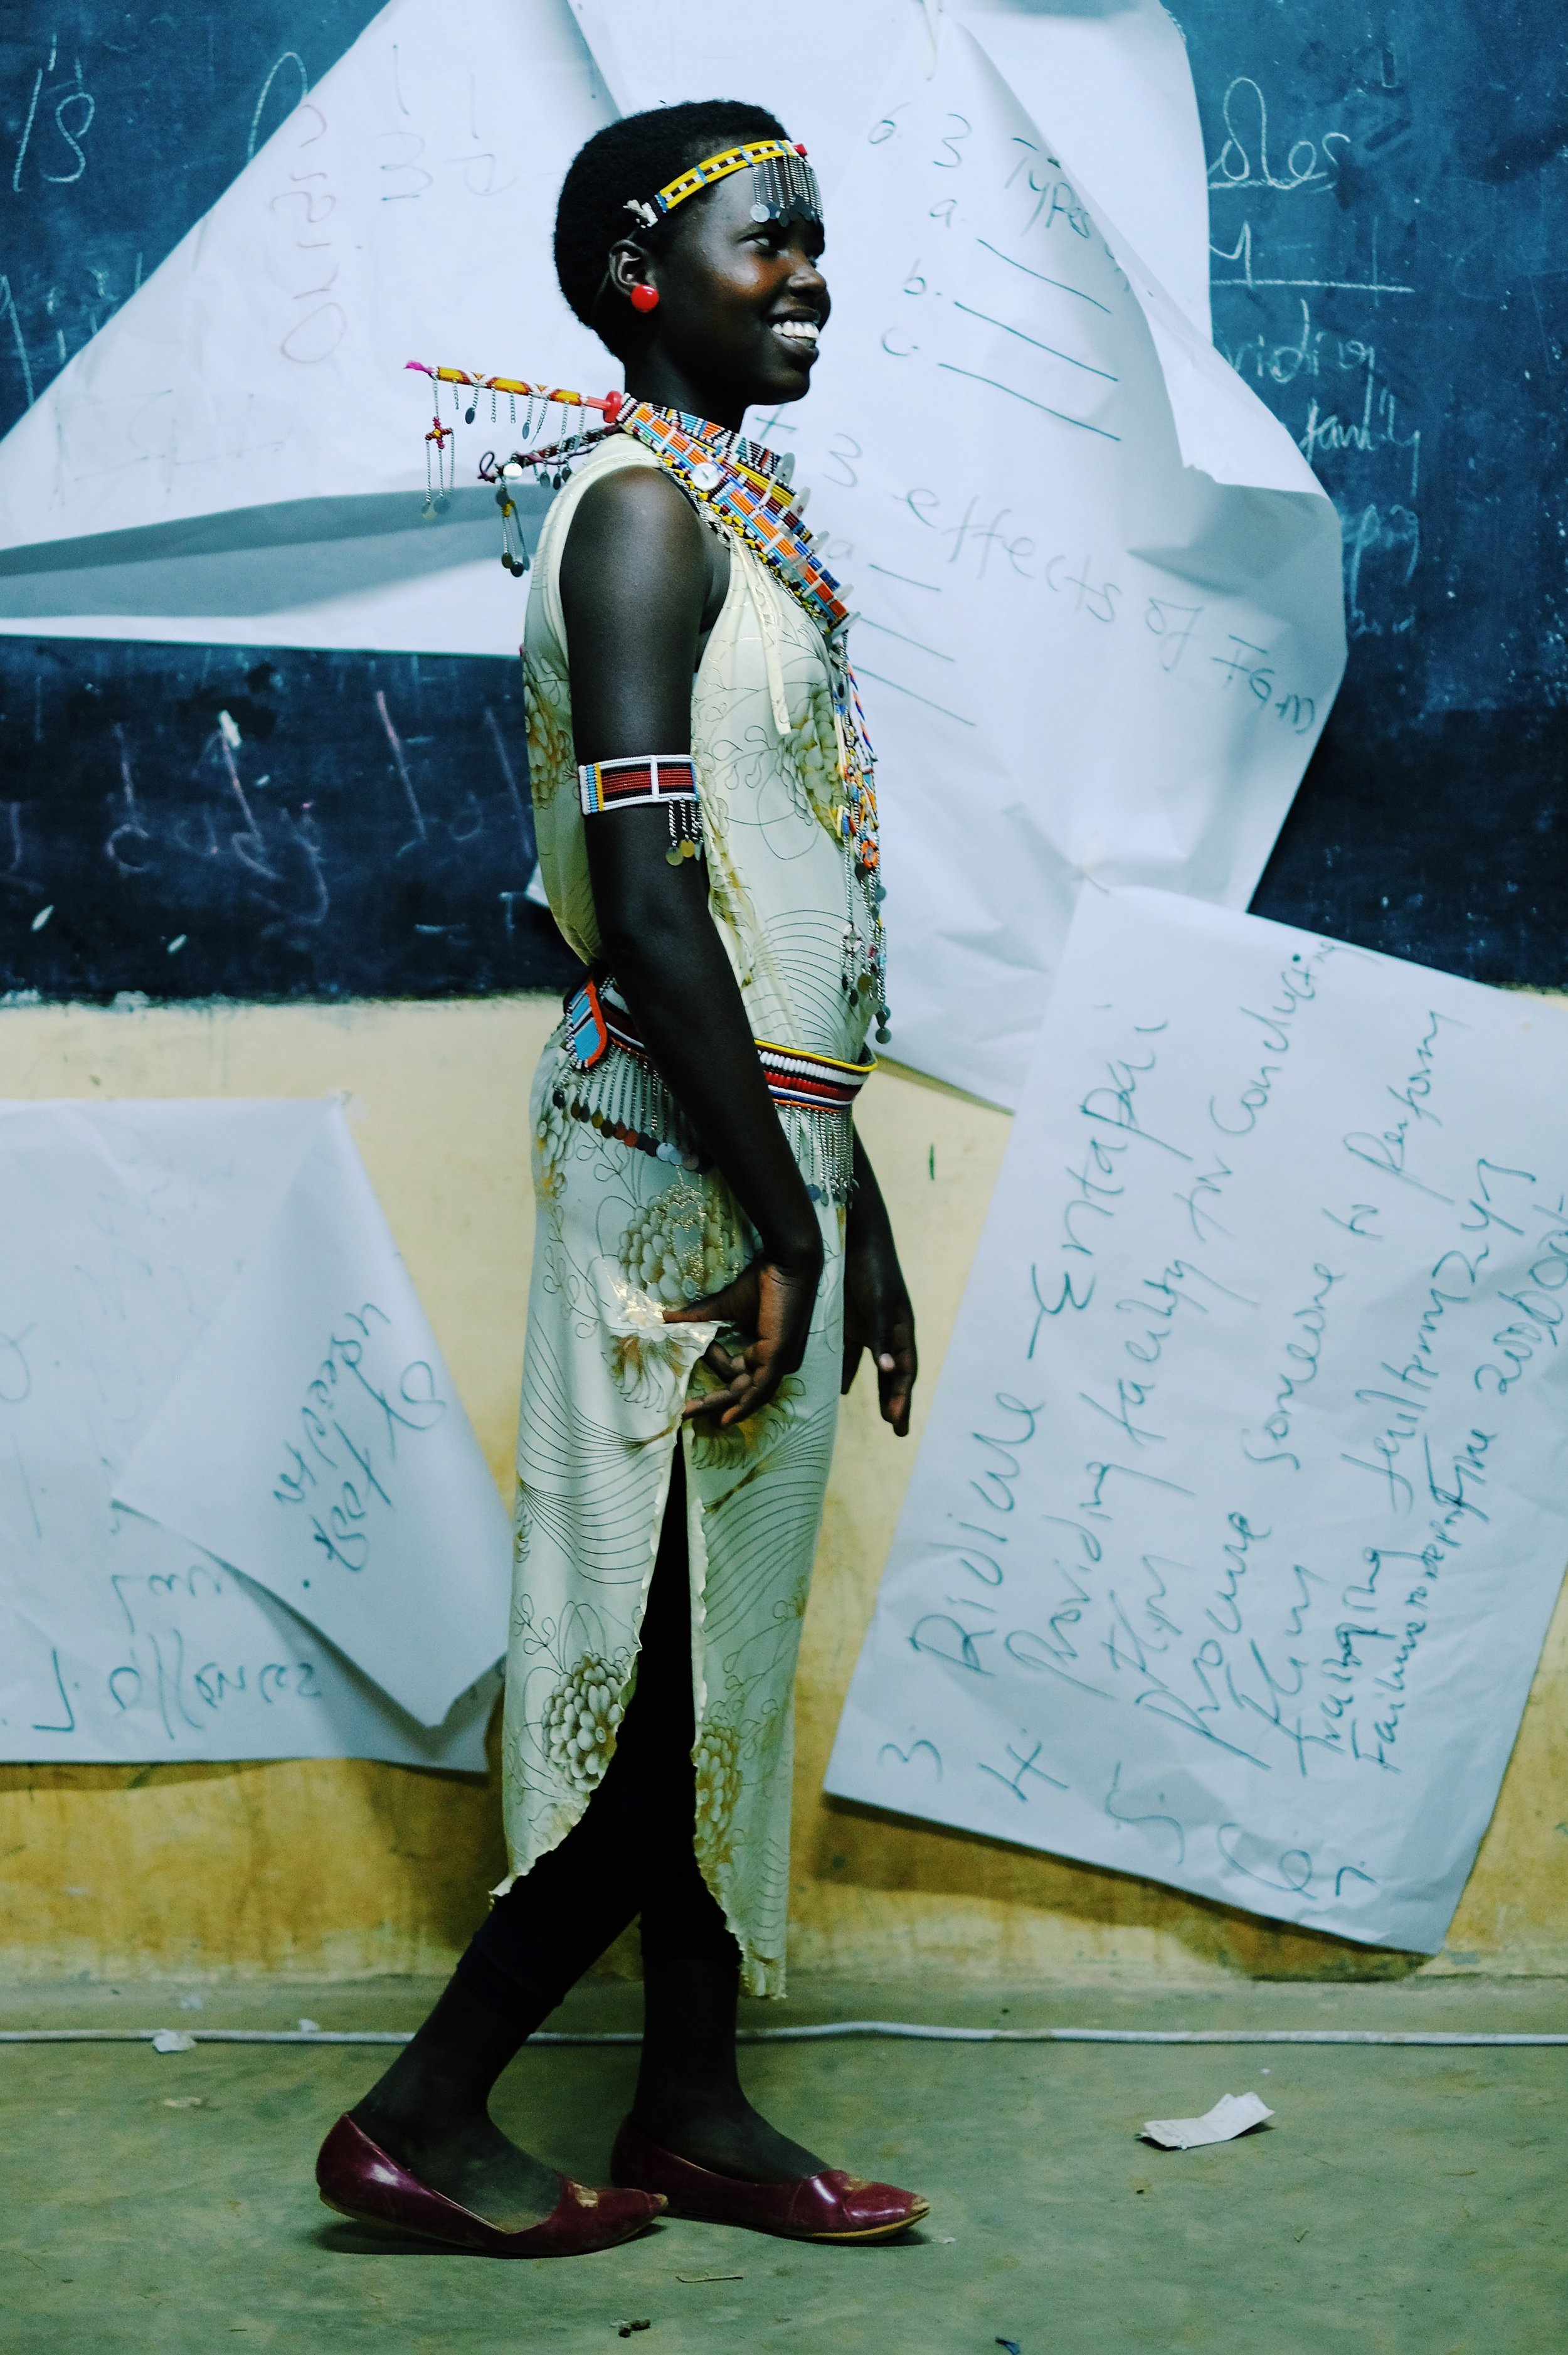 Maasai Olentoko 'End FGM' Beauty Pageant 7 by Joost Bastmeijer.jpeg